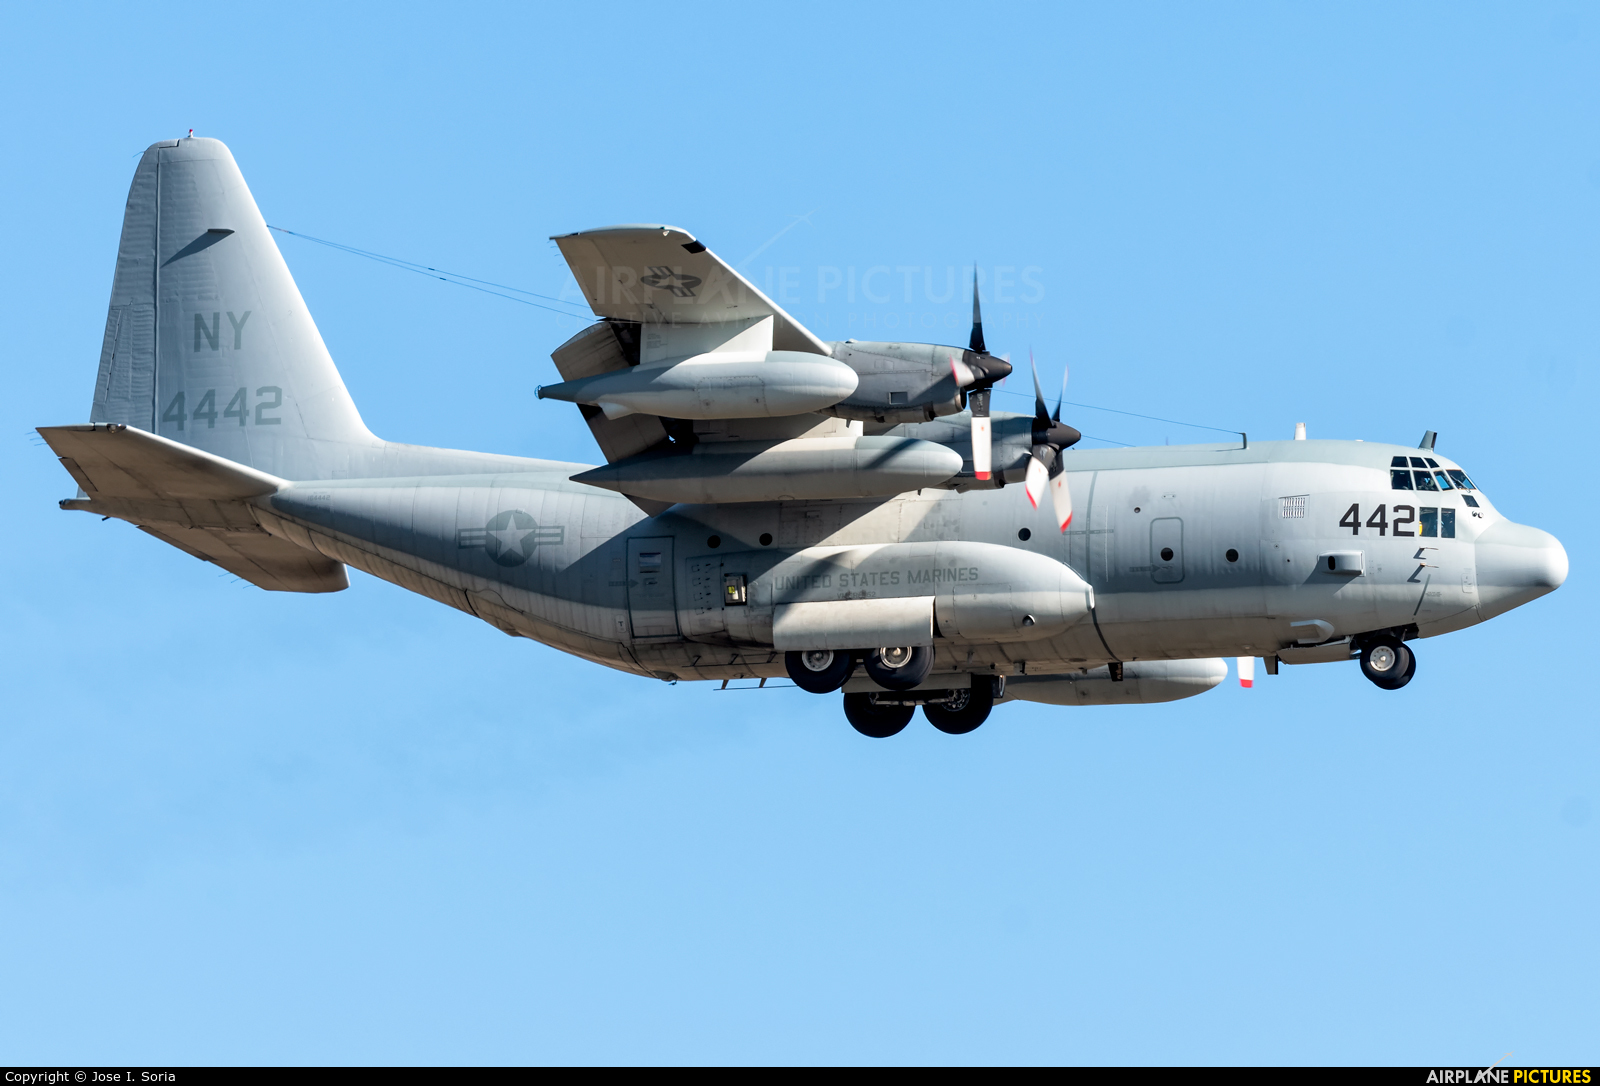 USA - Navy 164442 aircraft at Madrid - Torrejon